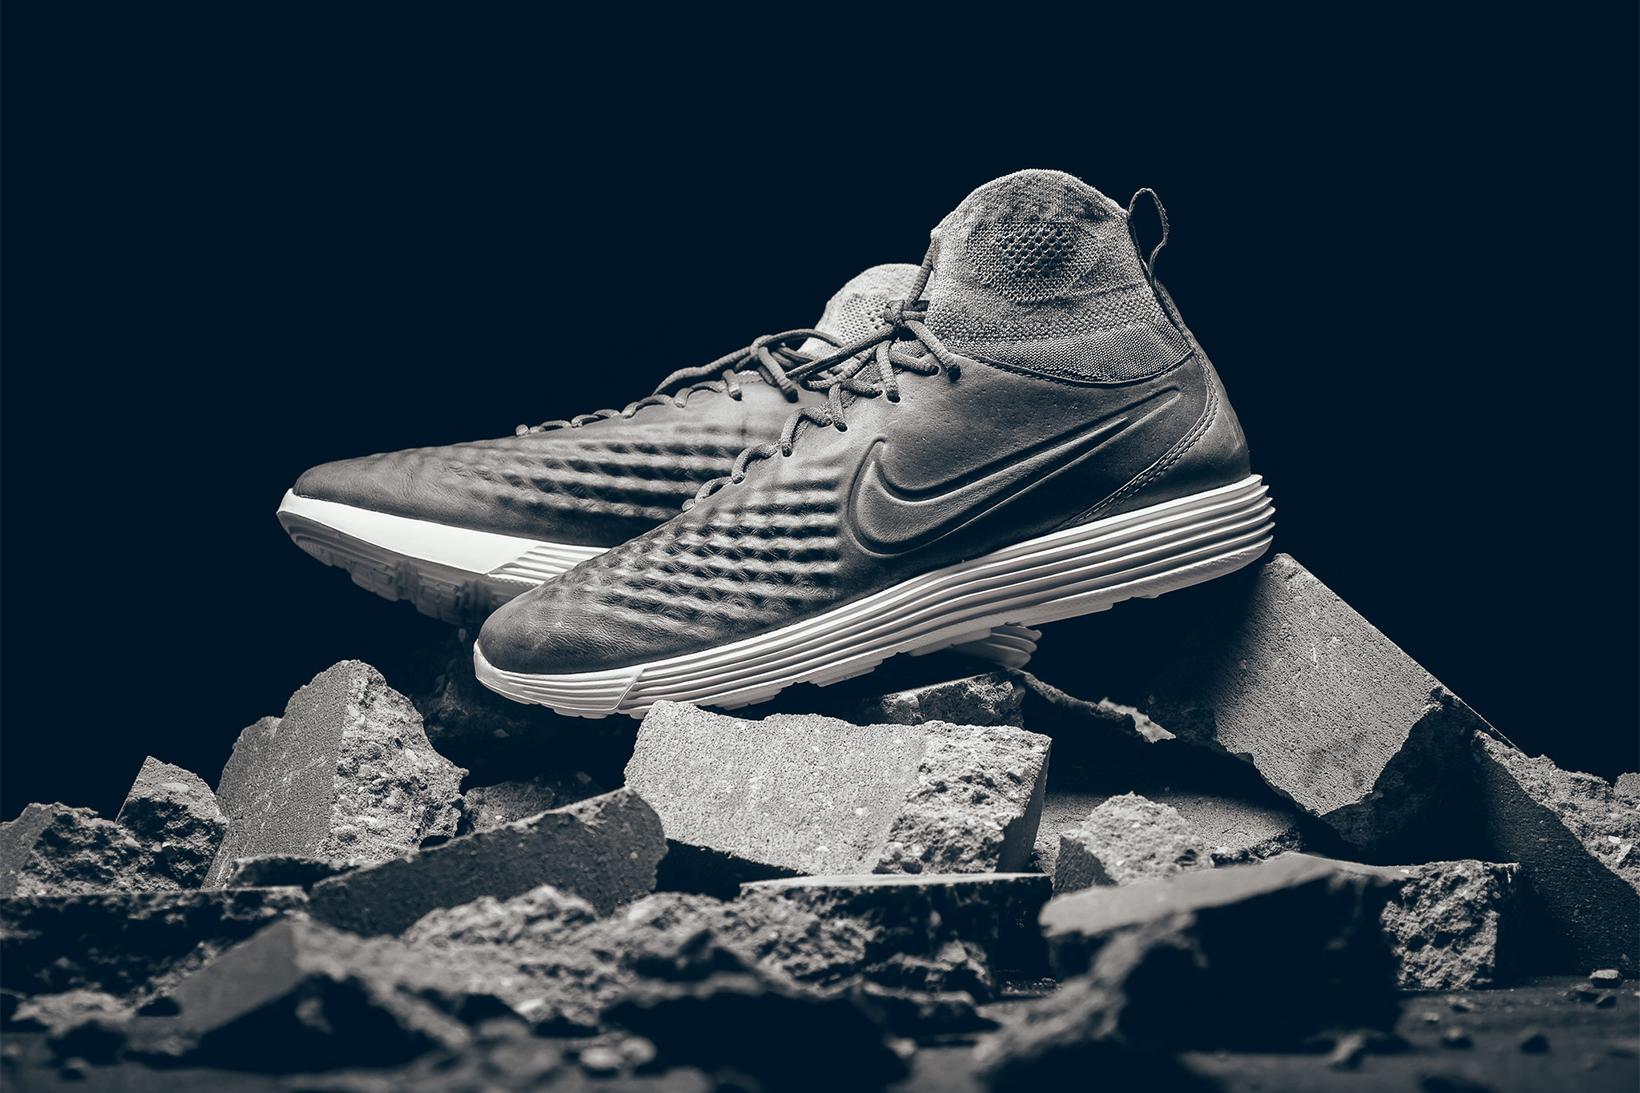 Nike Brings Back the Original Lunar Sole for the Lunar Magista II Flyknit